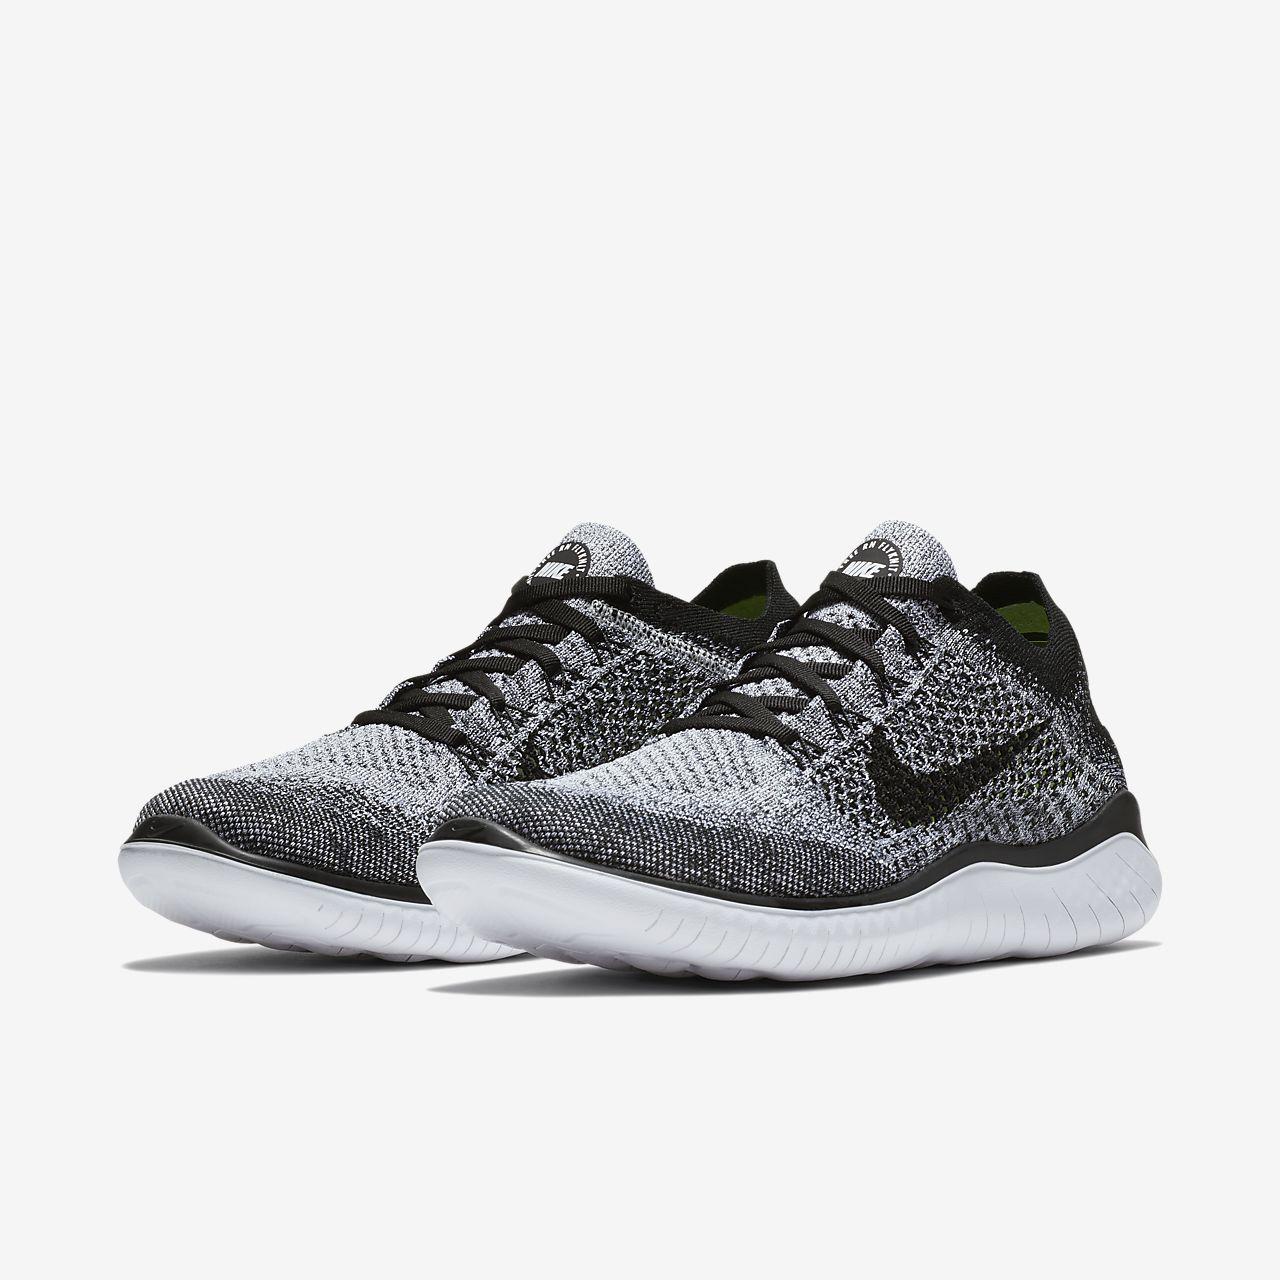 Nike - Free RN Flyknit 2018 Hommes chaussure de course (gris clair) - EU